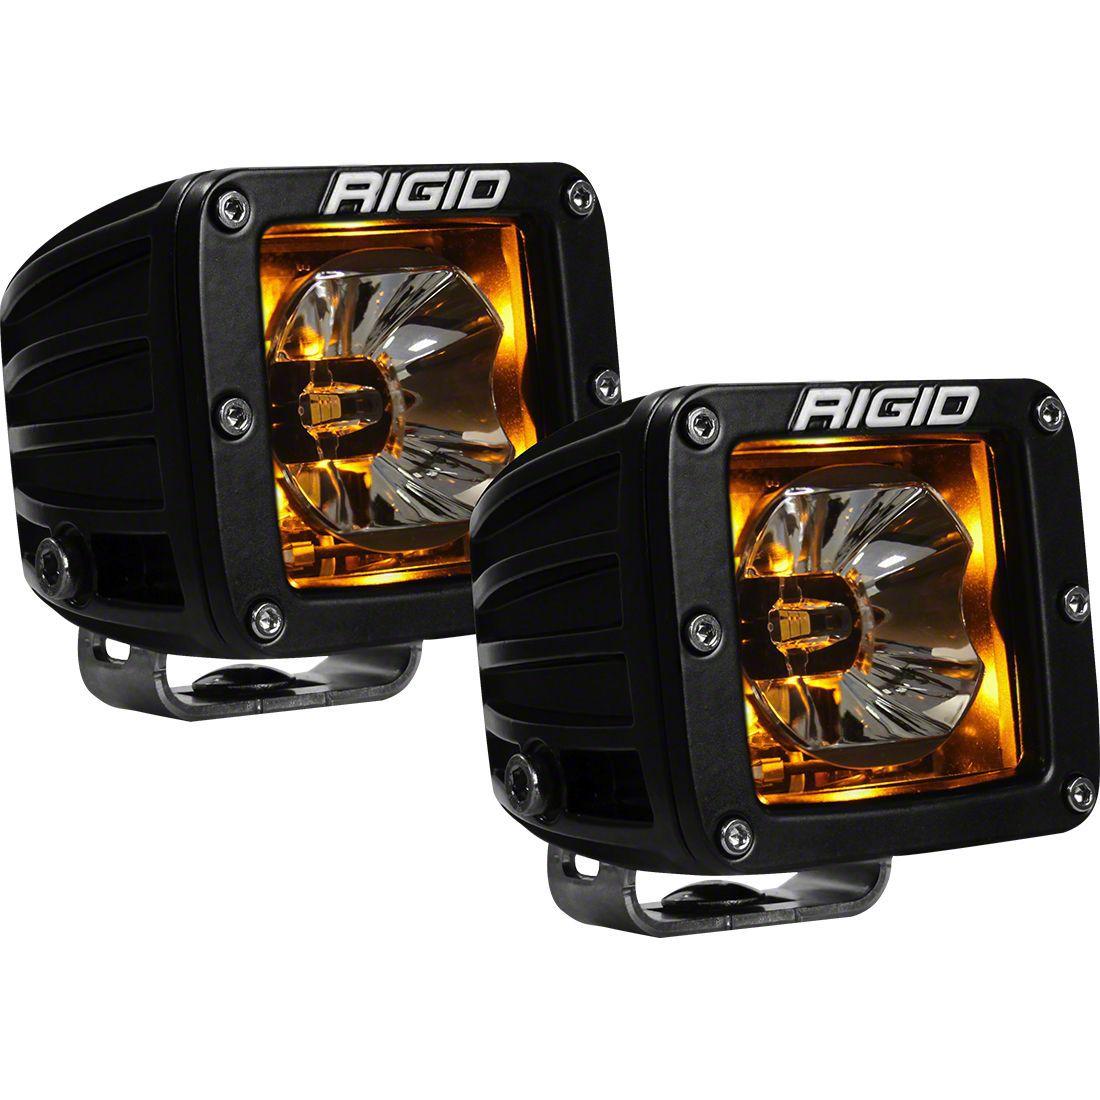 Rigid Industries D-Series Radiance LED Cube Lights w/ Flood/Spot Combo